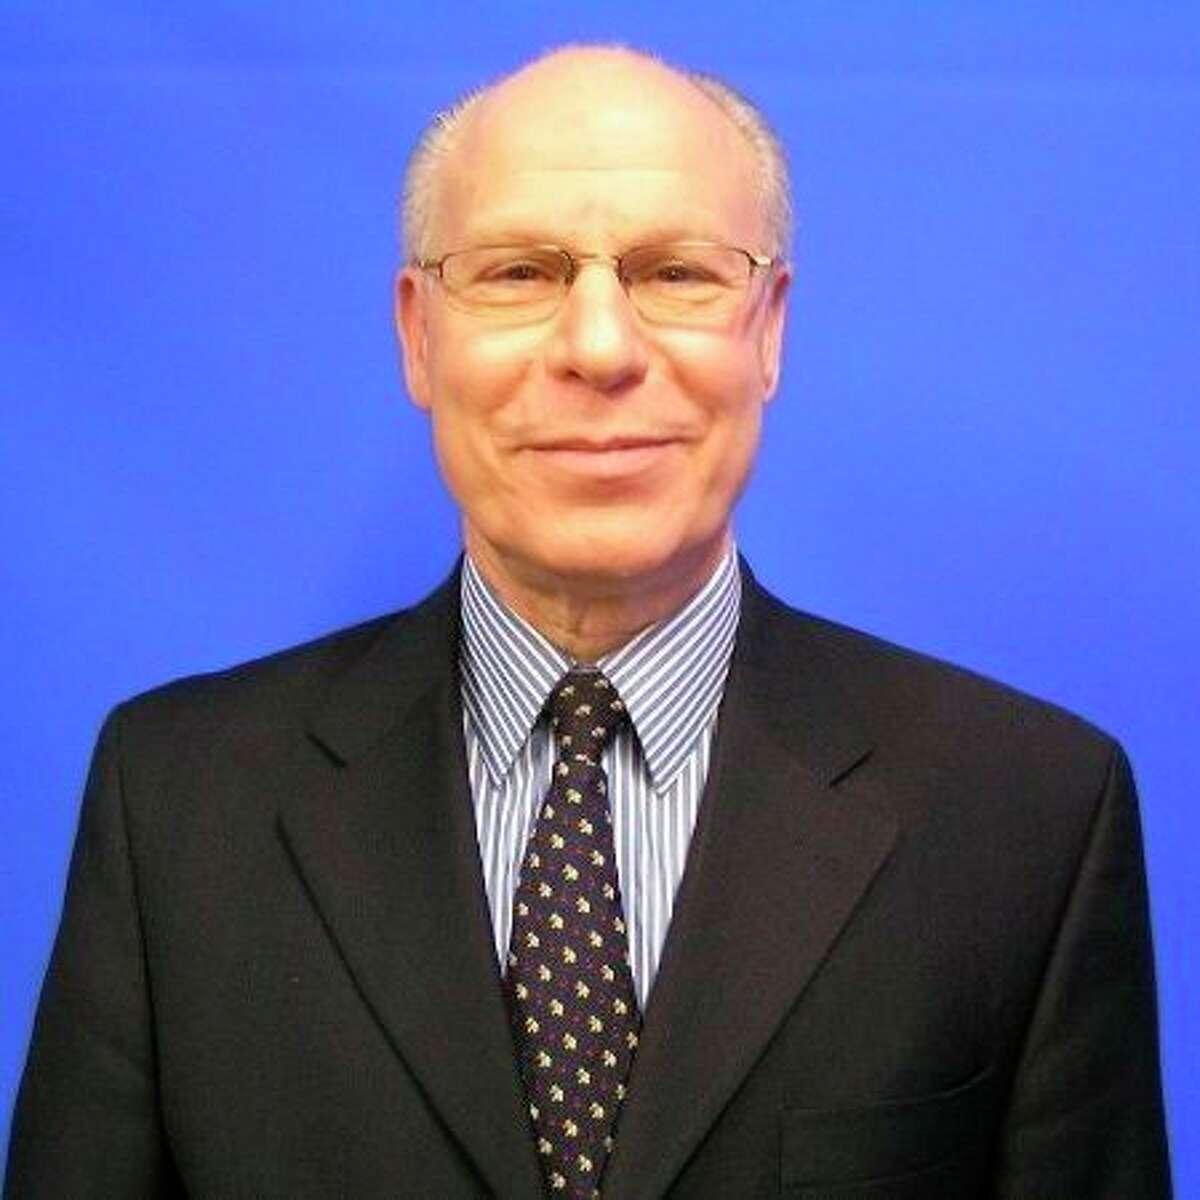 Marty Gottesman